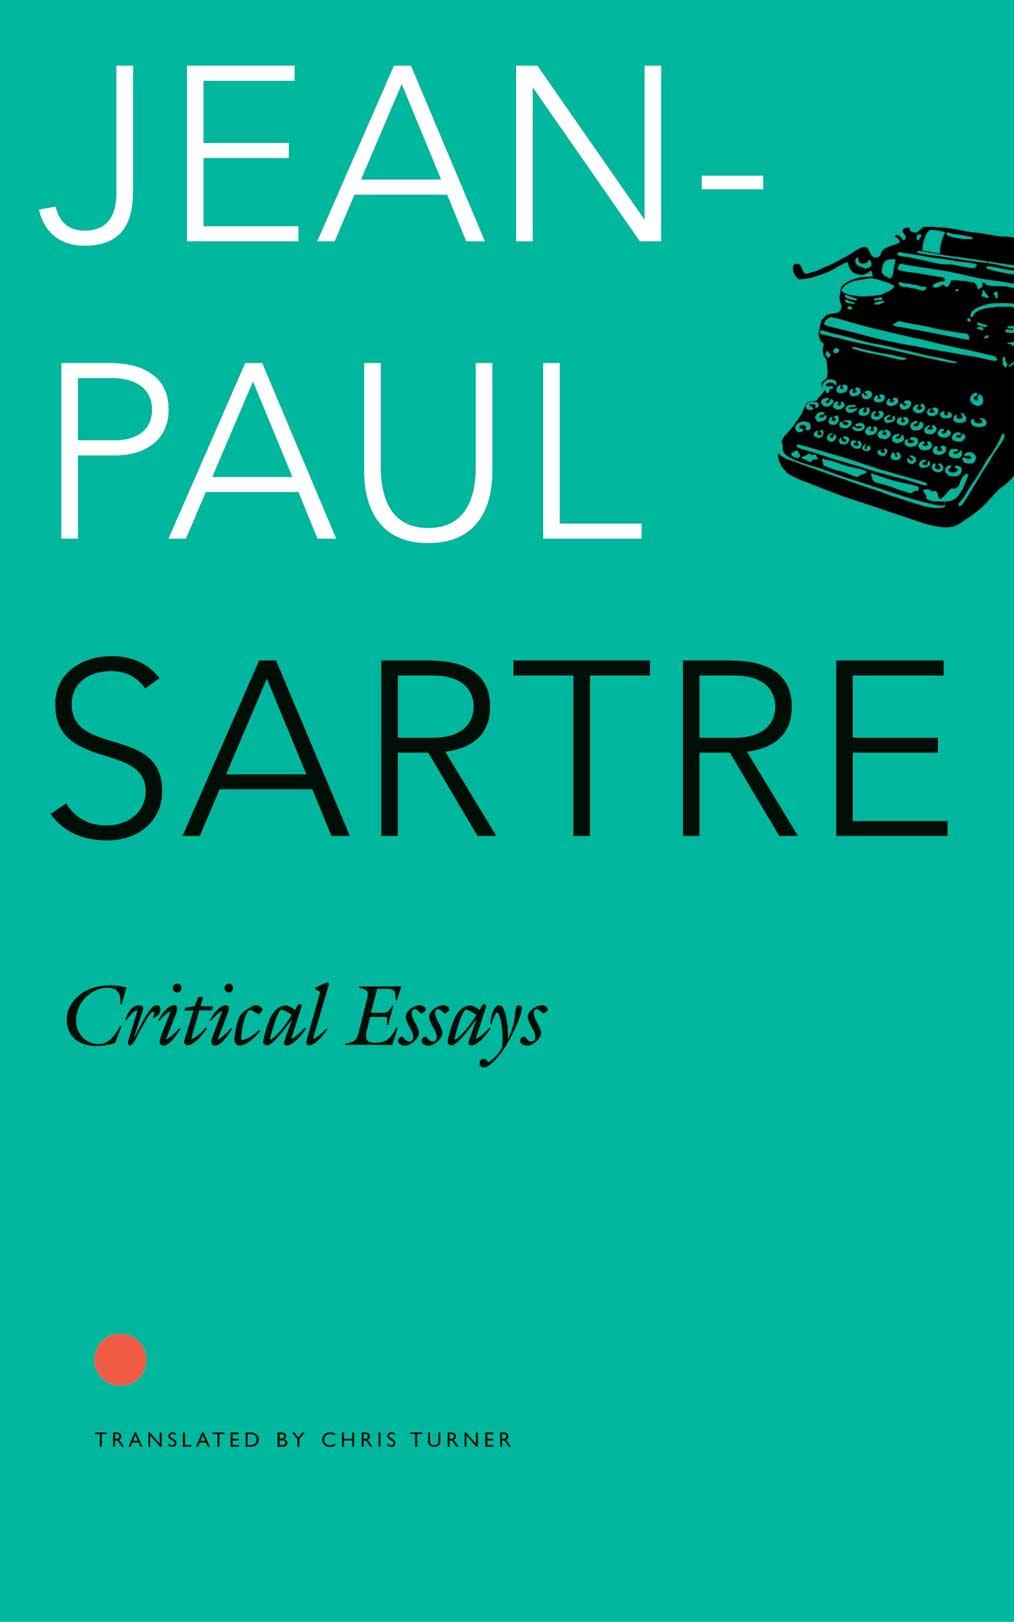 Critical Essays by Jean-Paul Sartre  |  Seagull Books